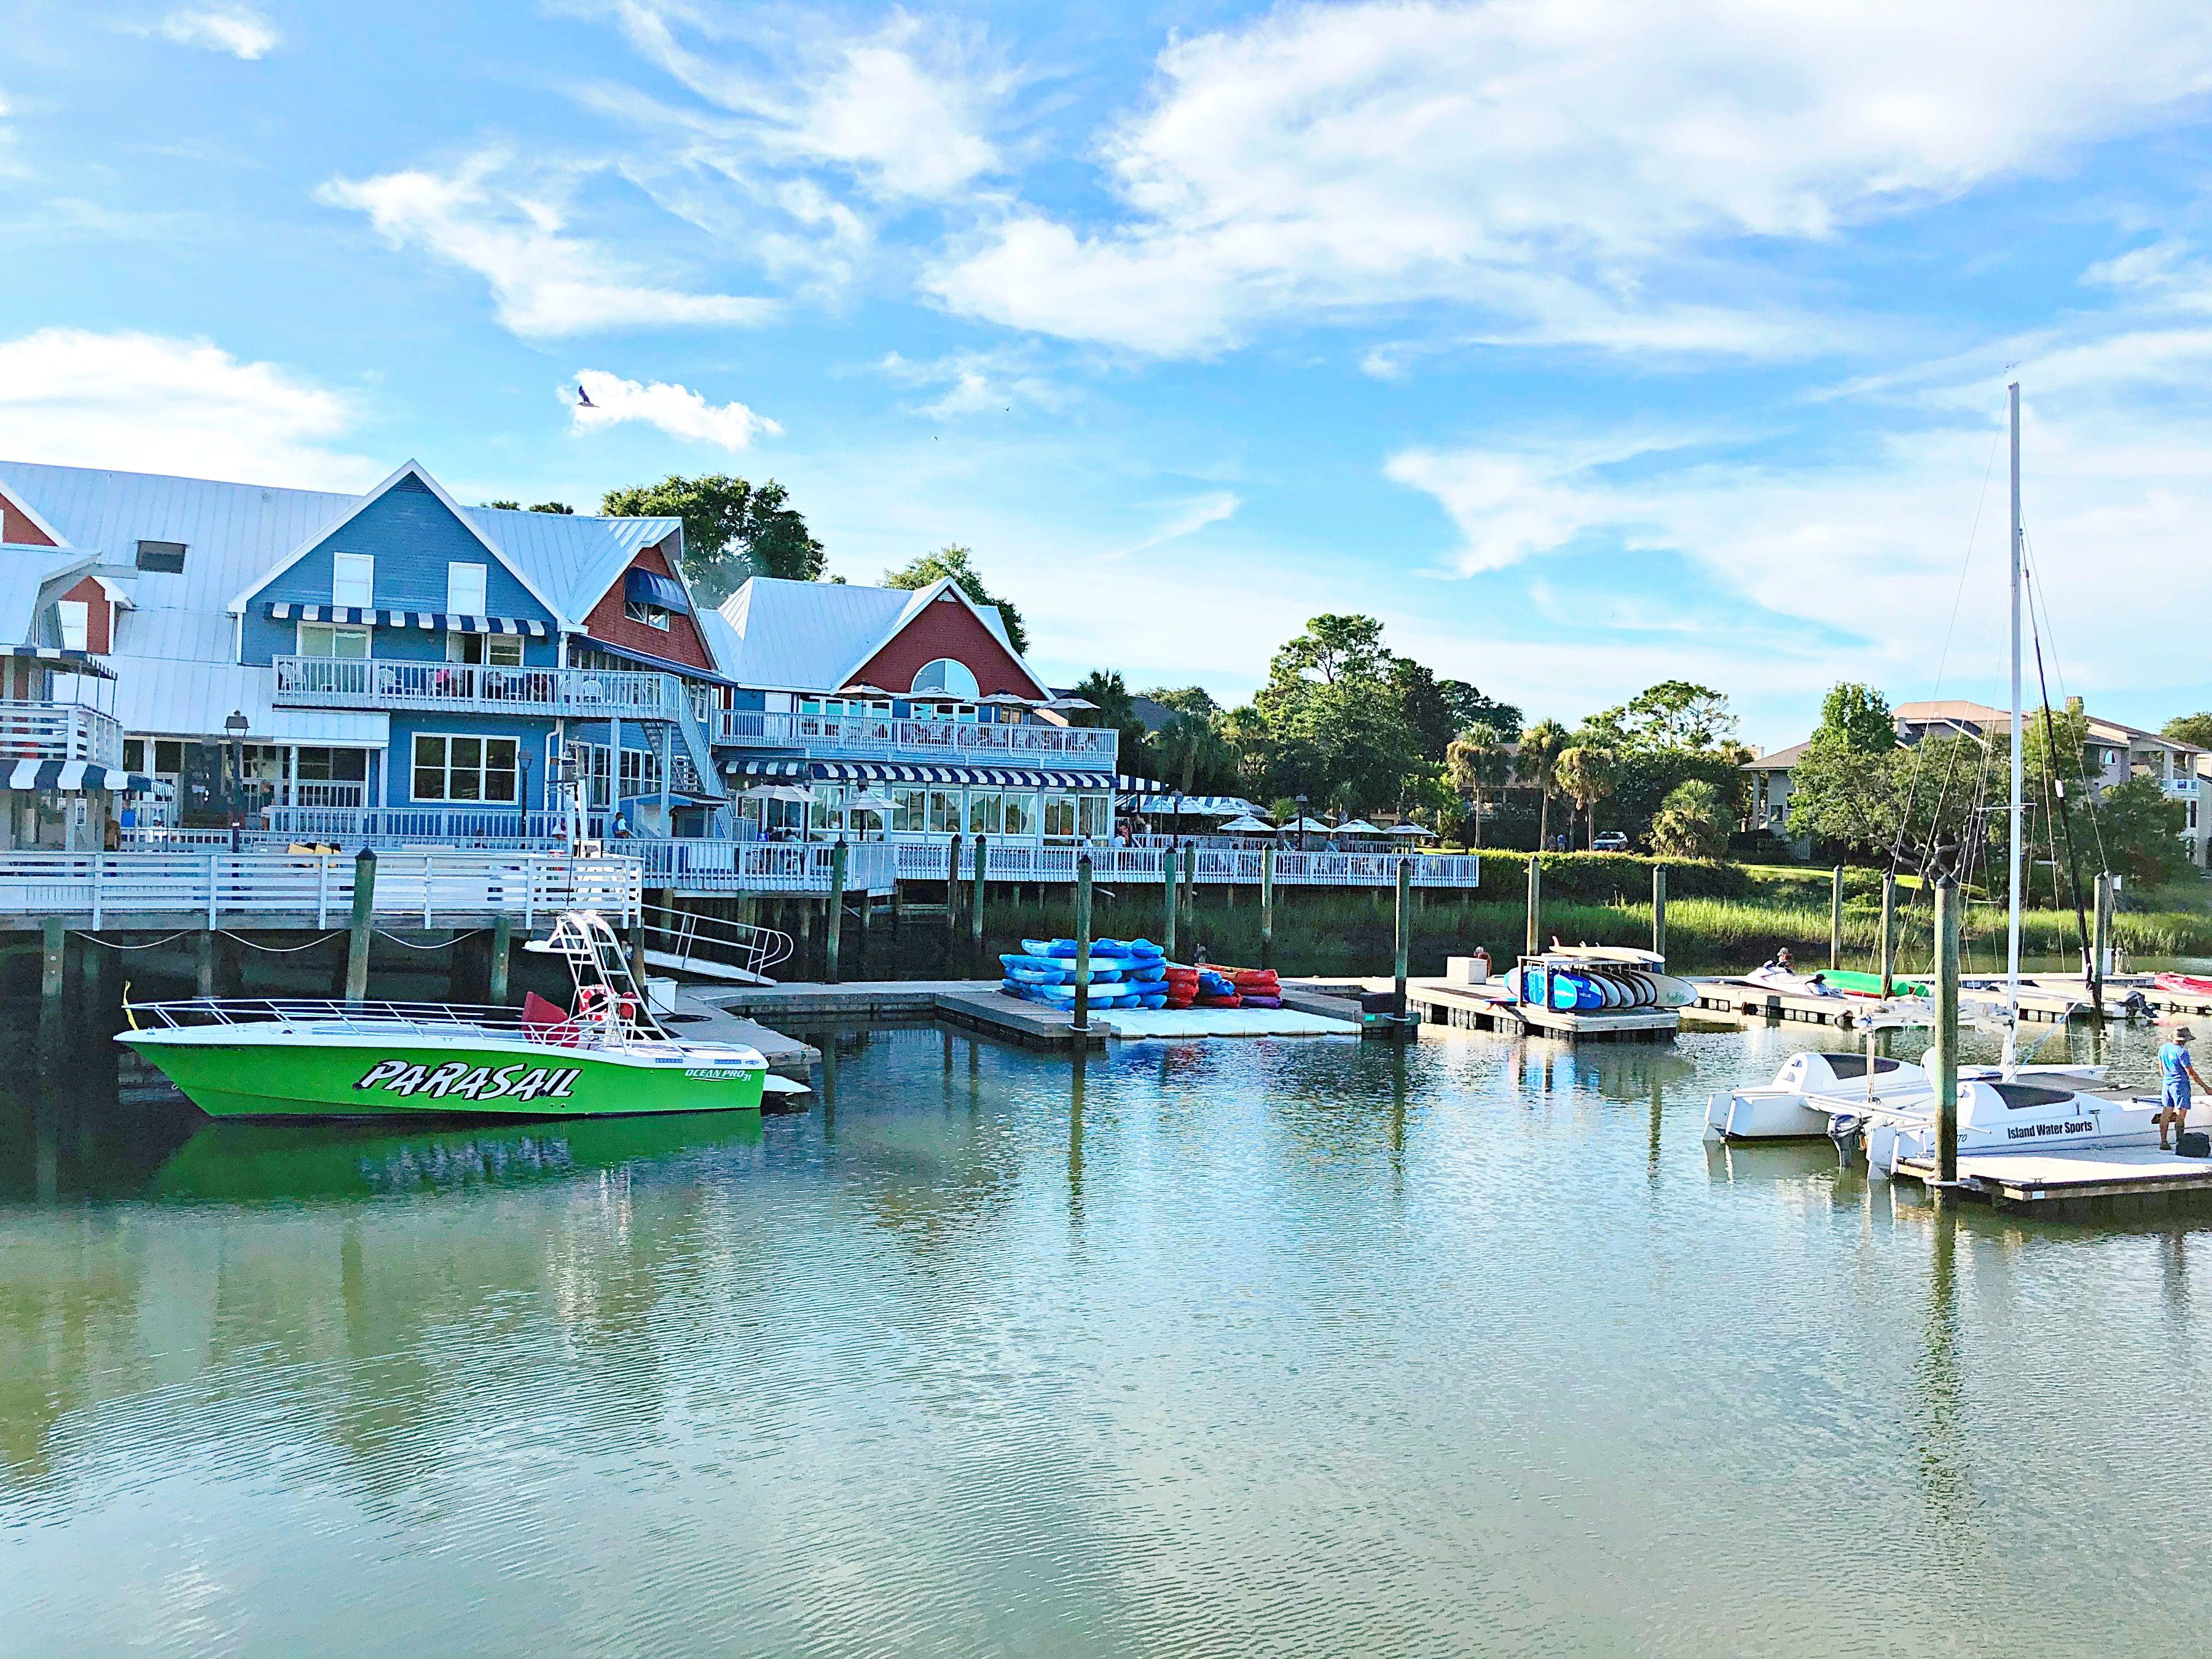 South Beach Marina Village Hilton Head Island Sc Sea Pines Resort Hilton Head Island